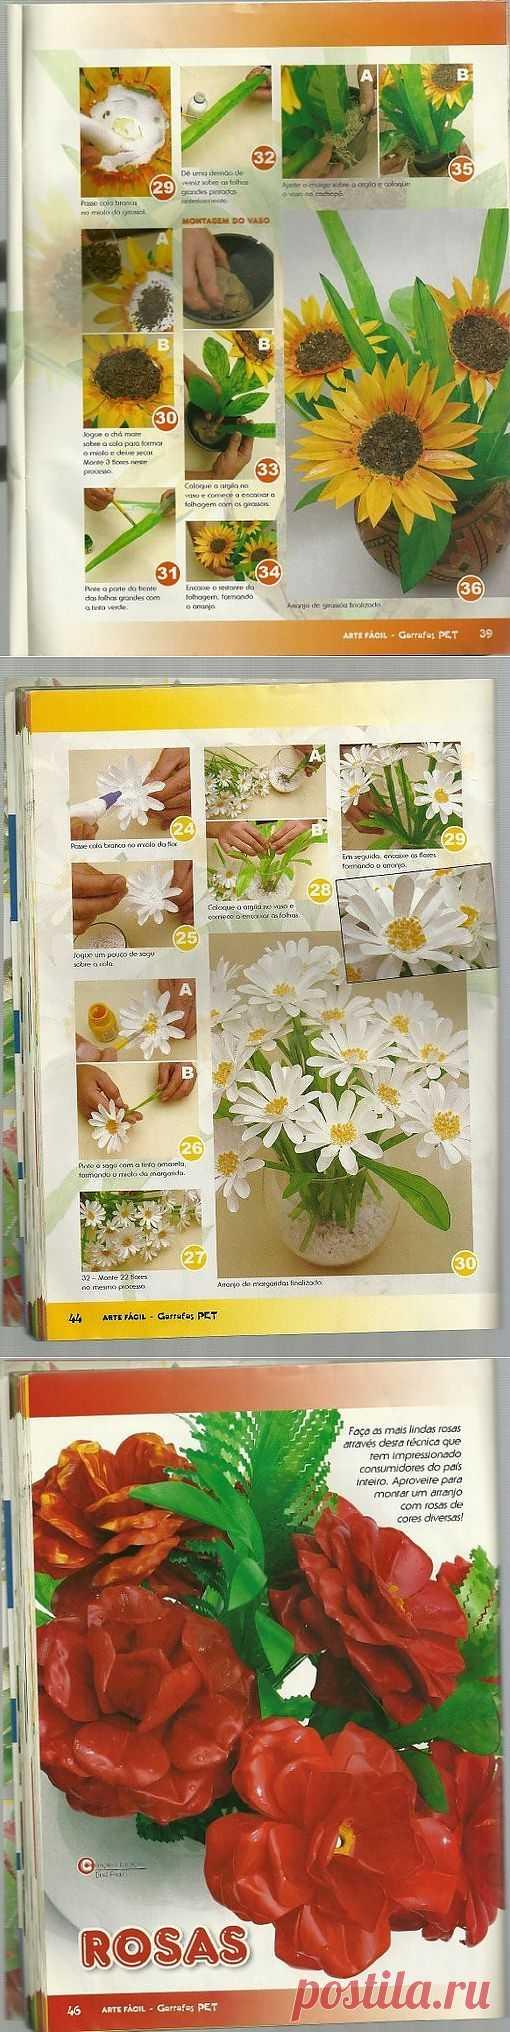 Подсолнухи,  ромашки и много других цветов.